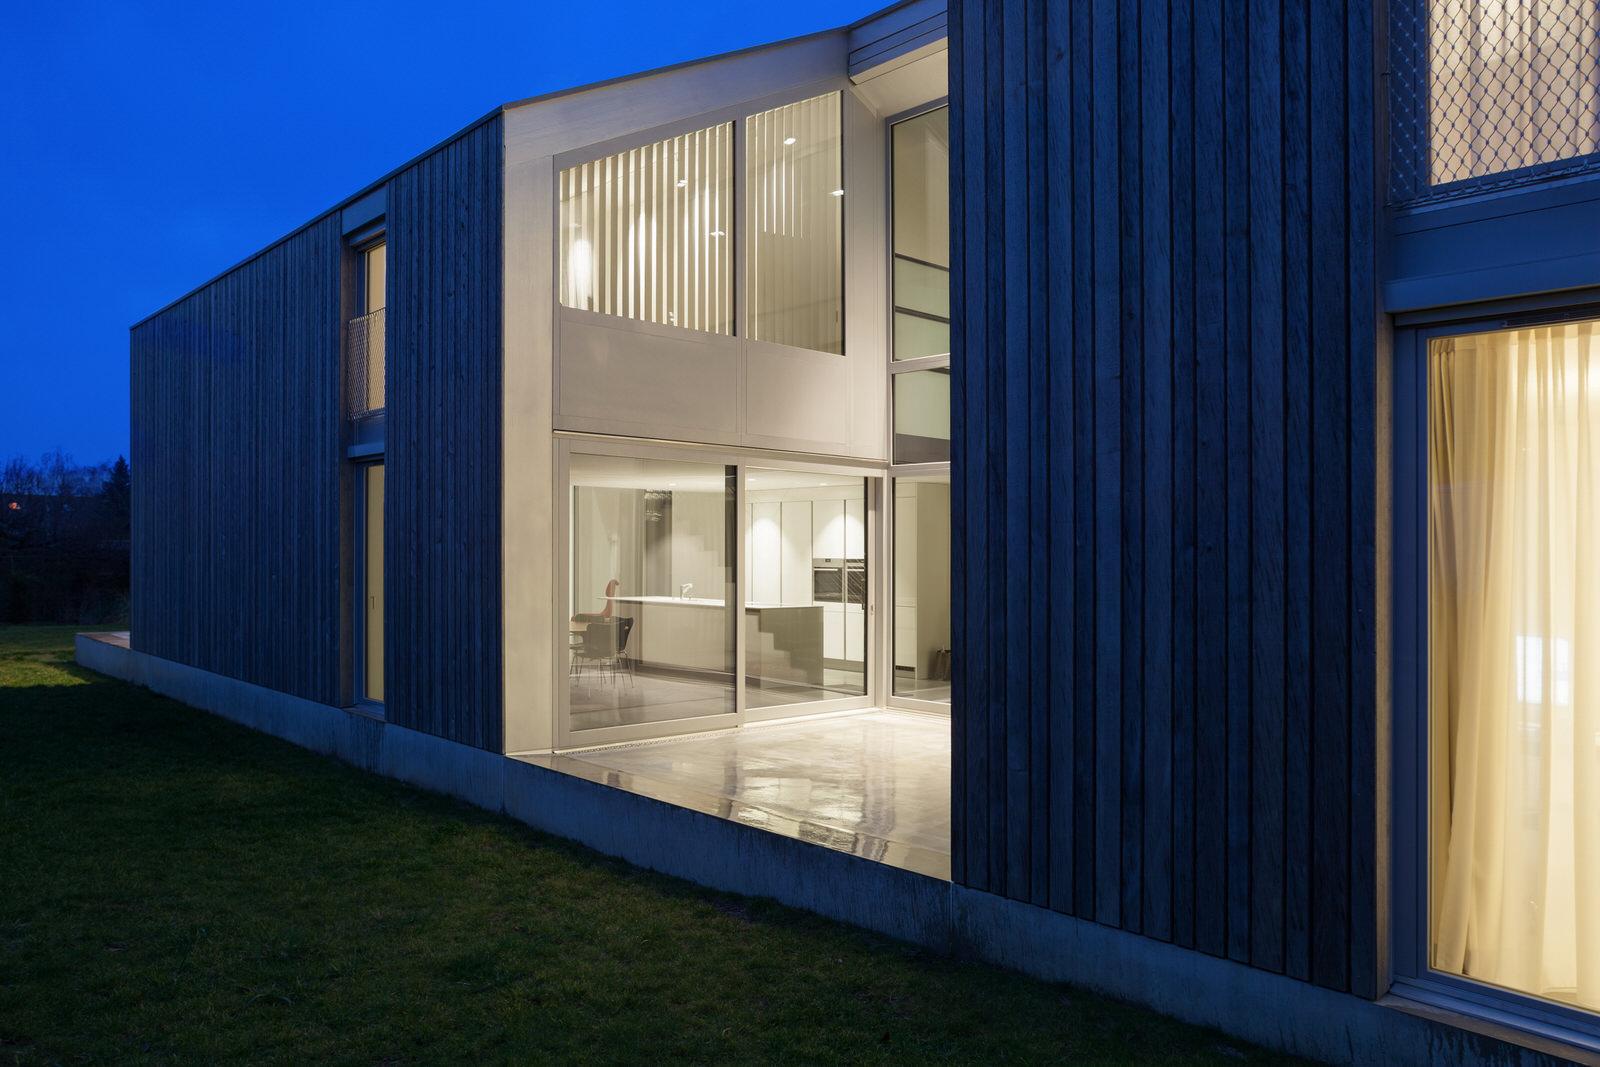 Lutron_Lighting_Contemporary_Modern_Smart_Home_Interior_Design_Mood_Lighting_Shades_Blinds